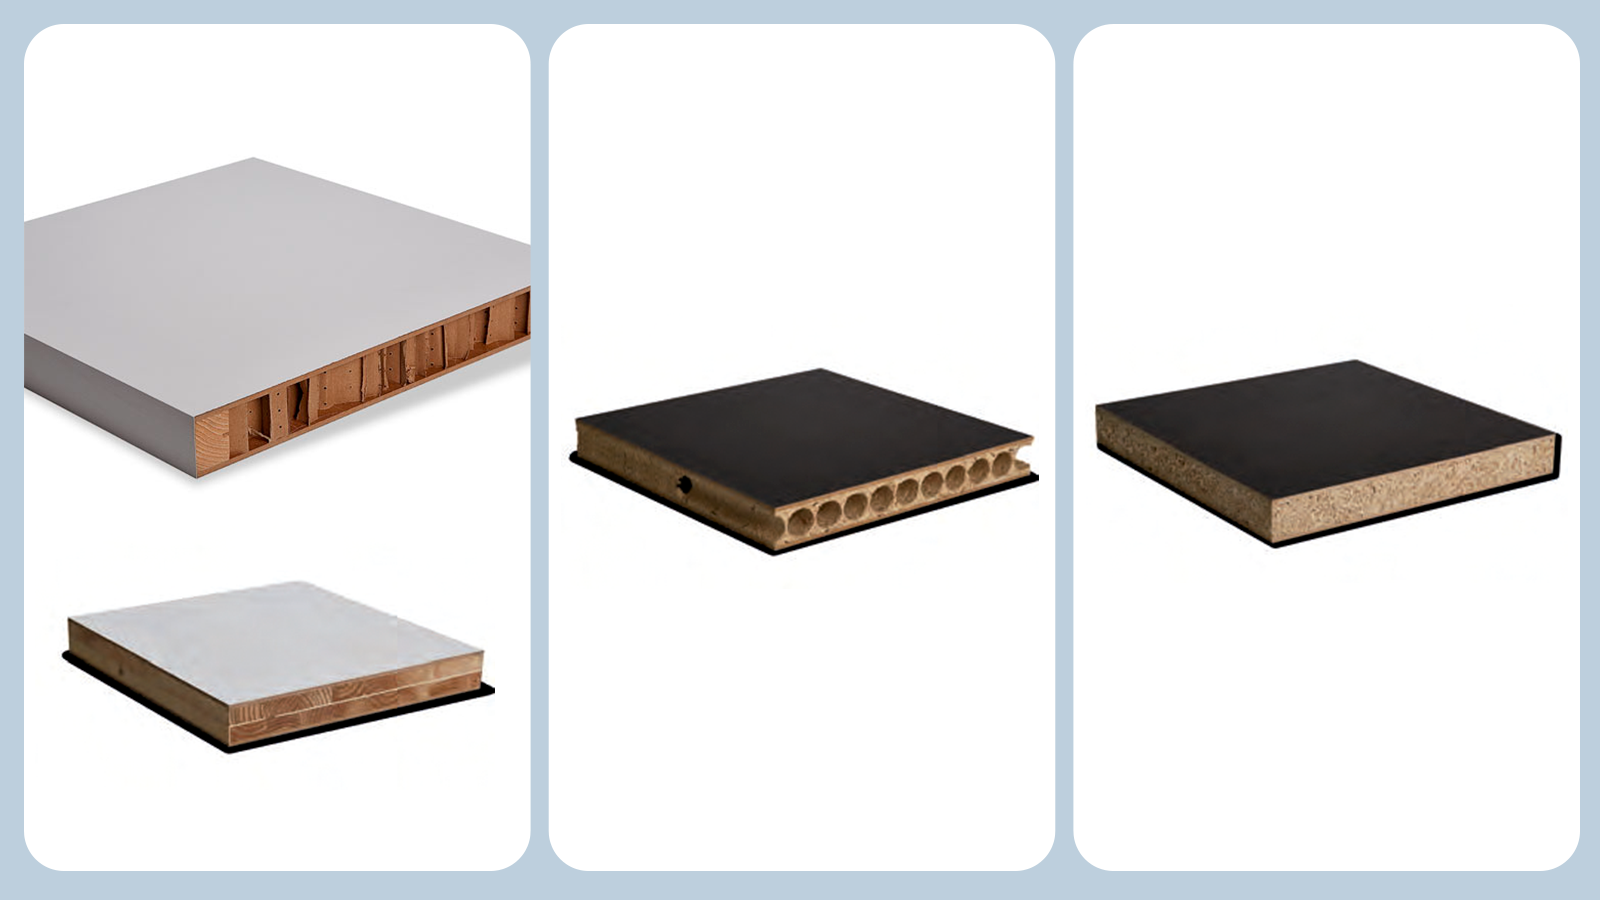 Tipos de rellenos de puertas prefabricadas para interiores